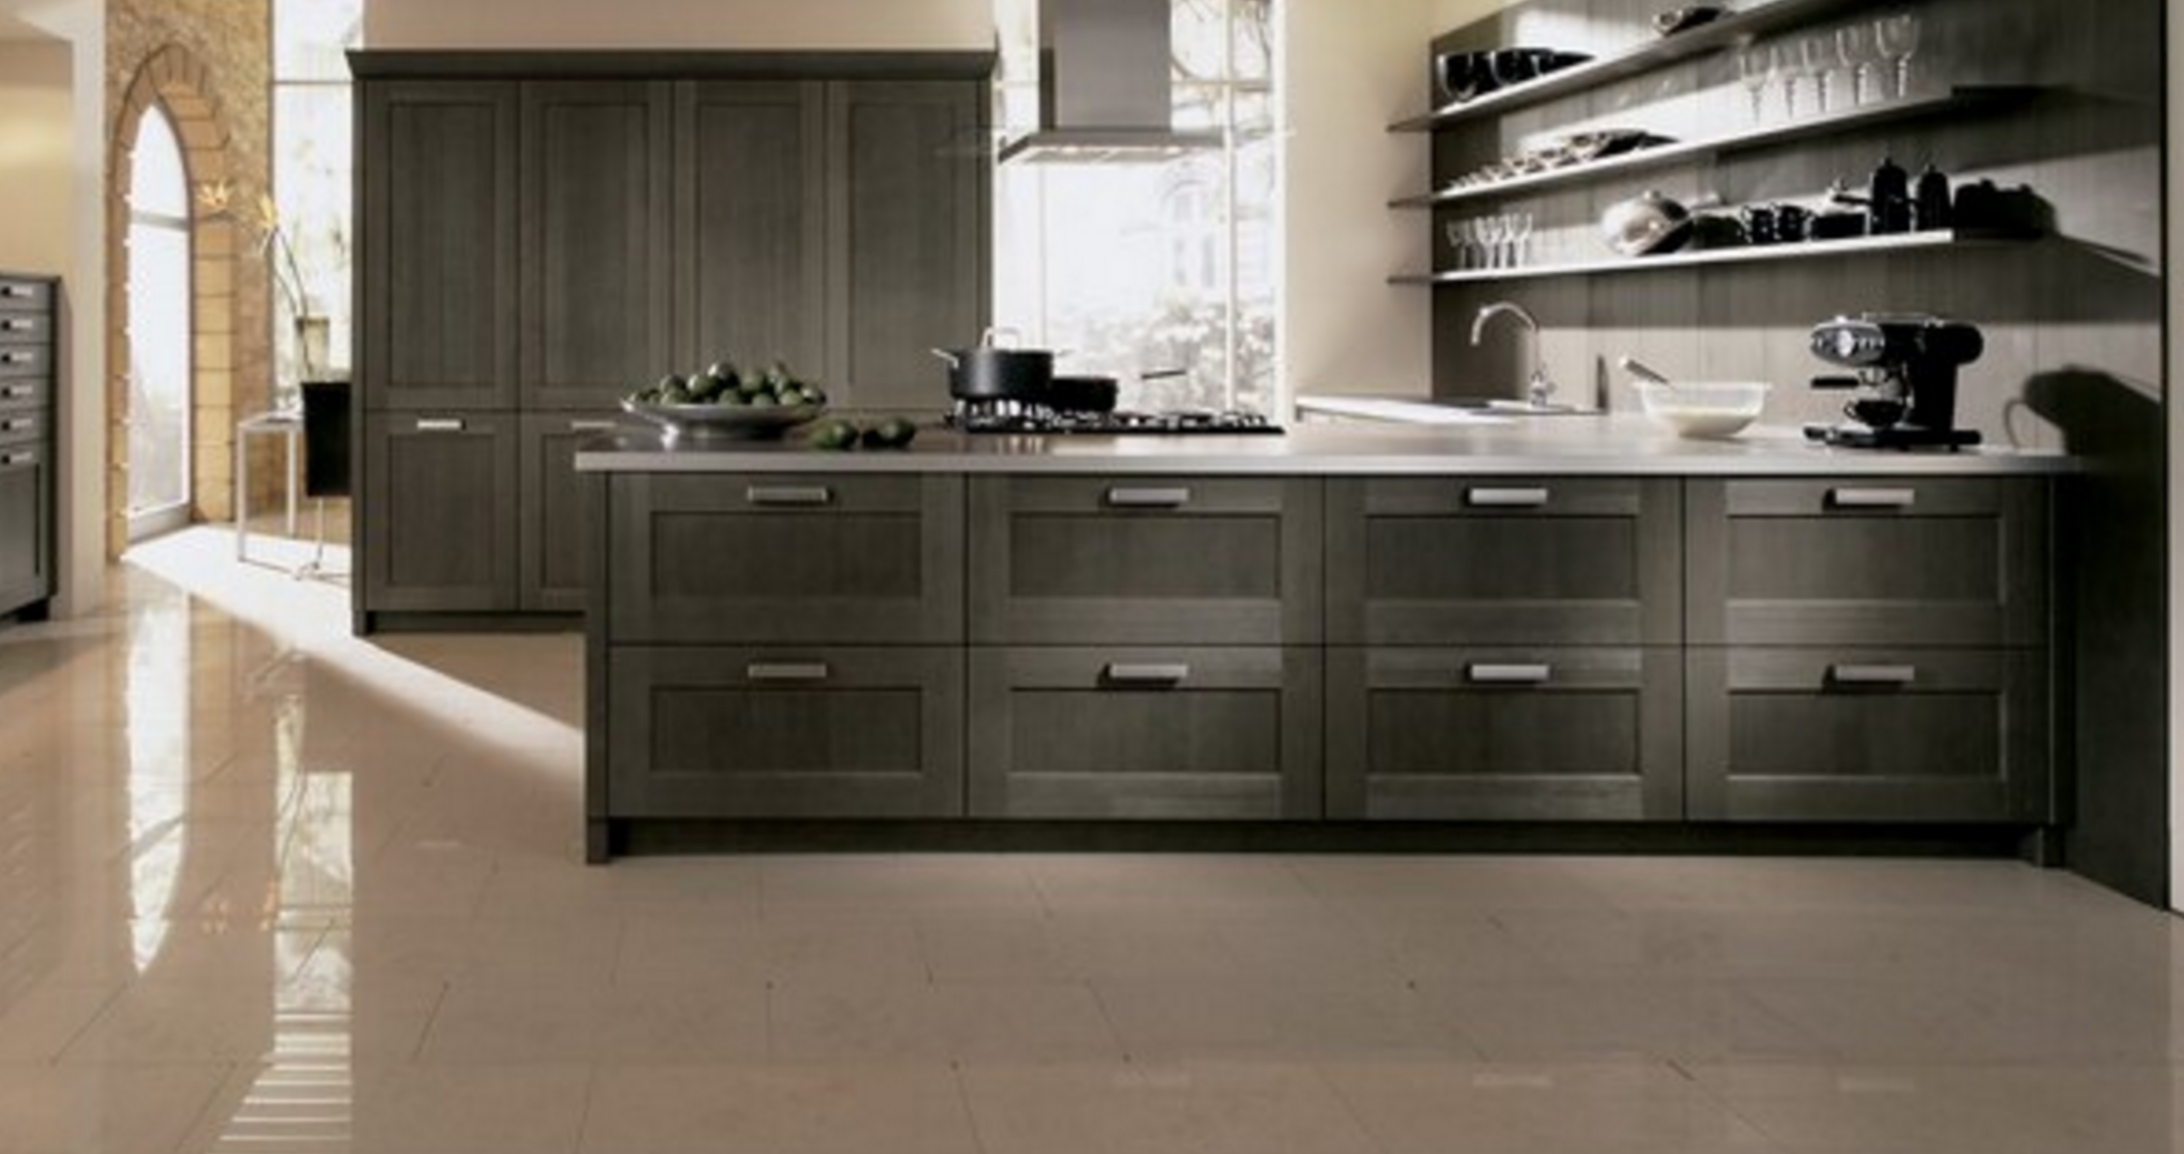 Hardware Kitchen Remodel Home Decor Kitchen